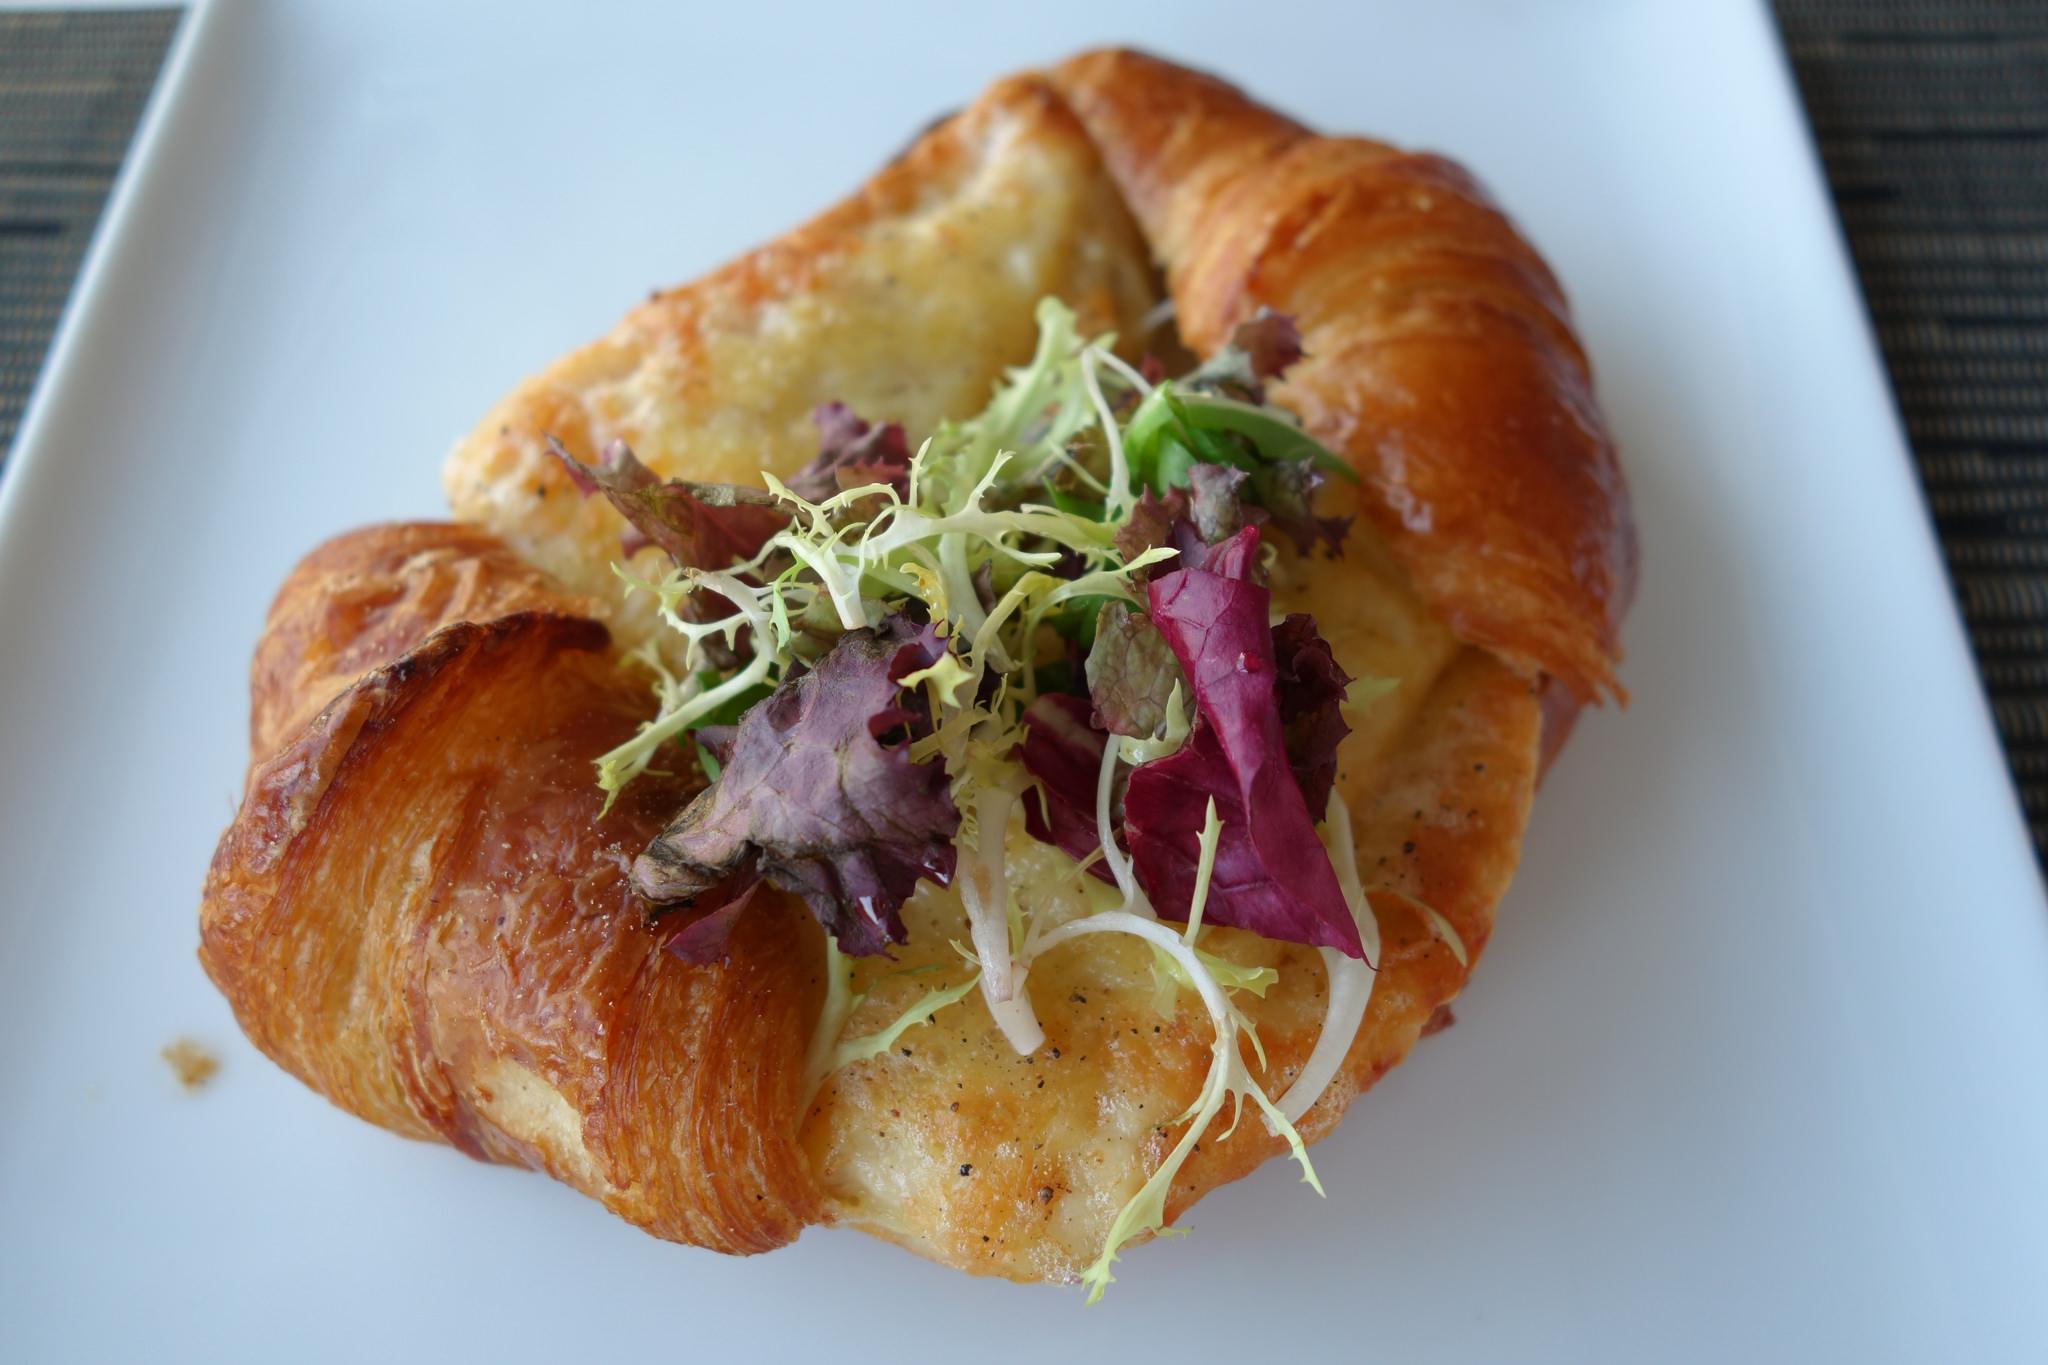 Sky-on-57-Croque-Monsieur-on-Croissant.jpg